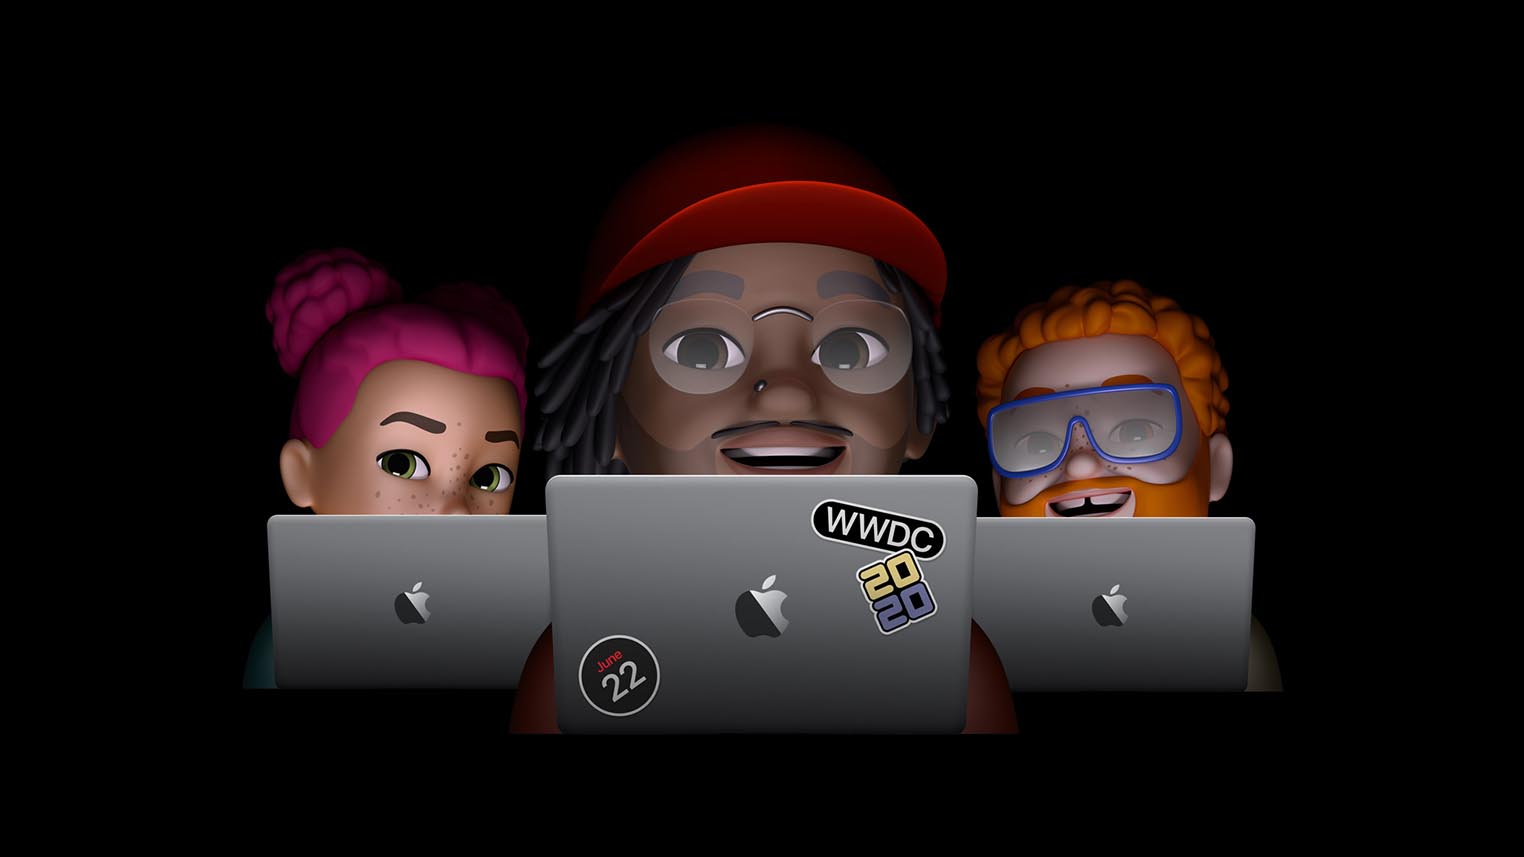 Visuel WWDC 2020